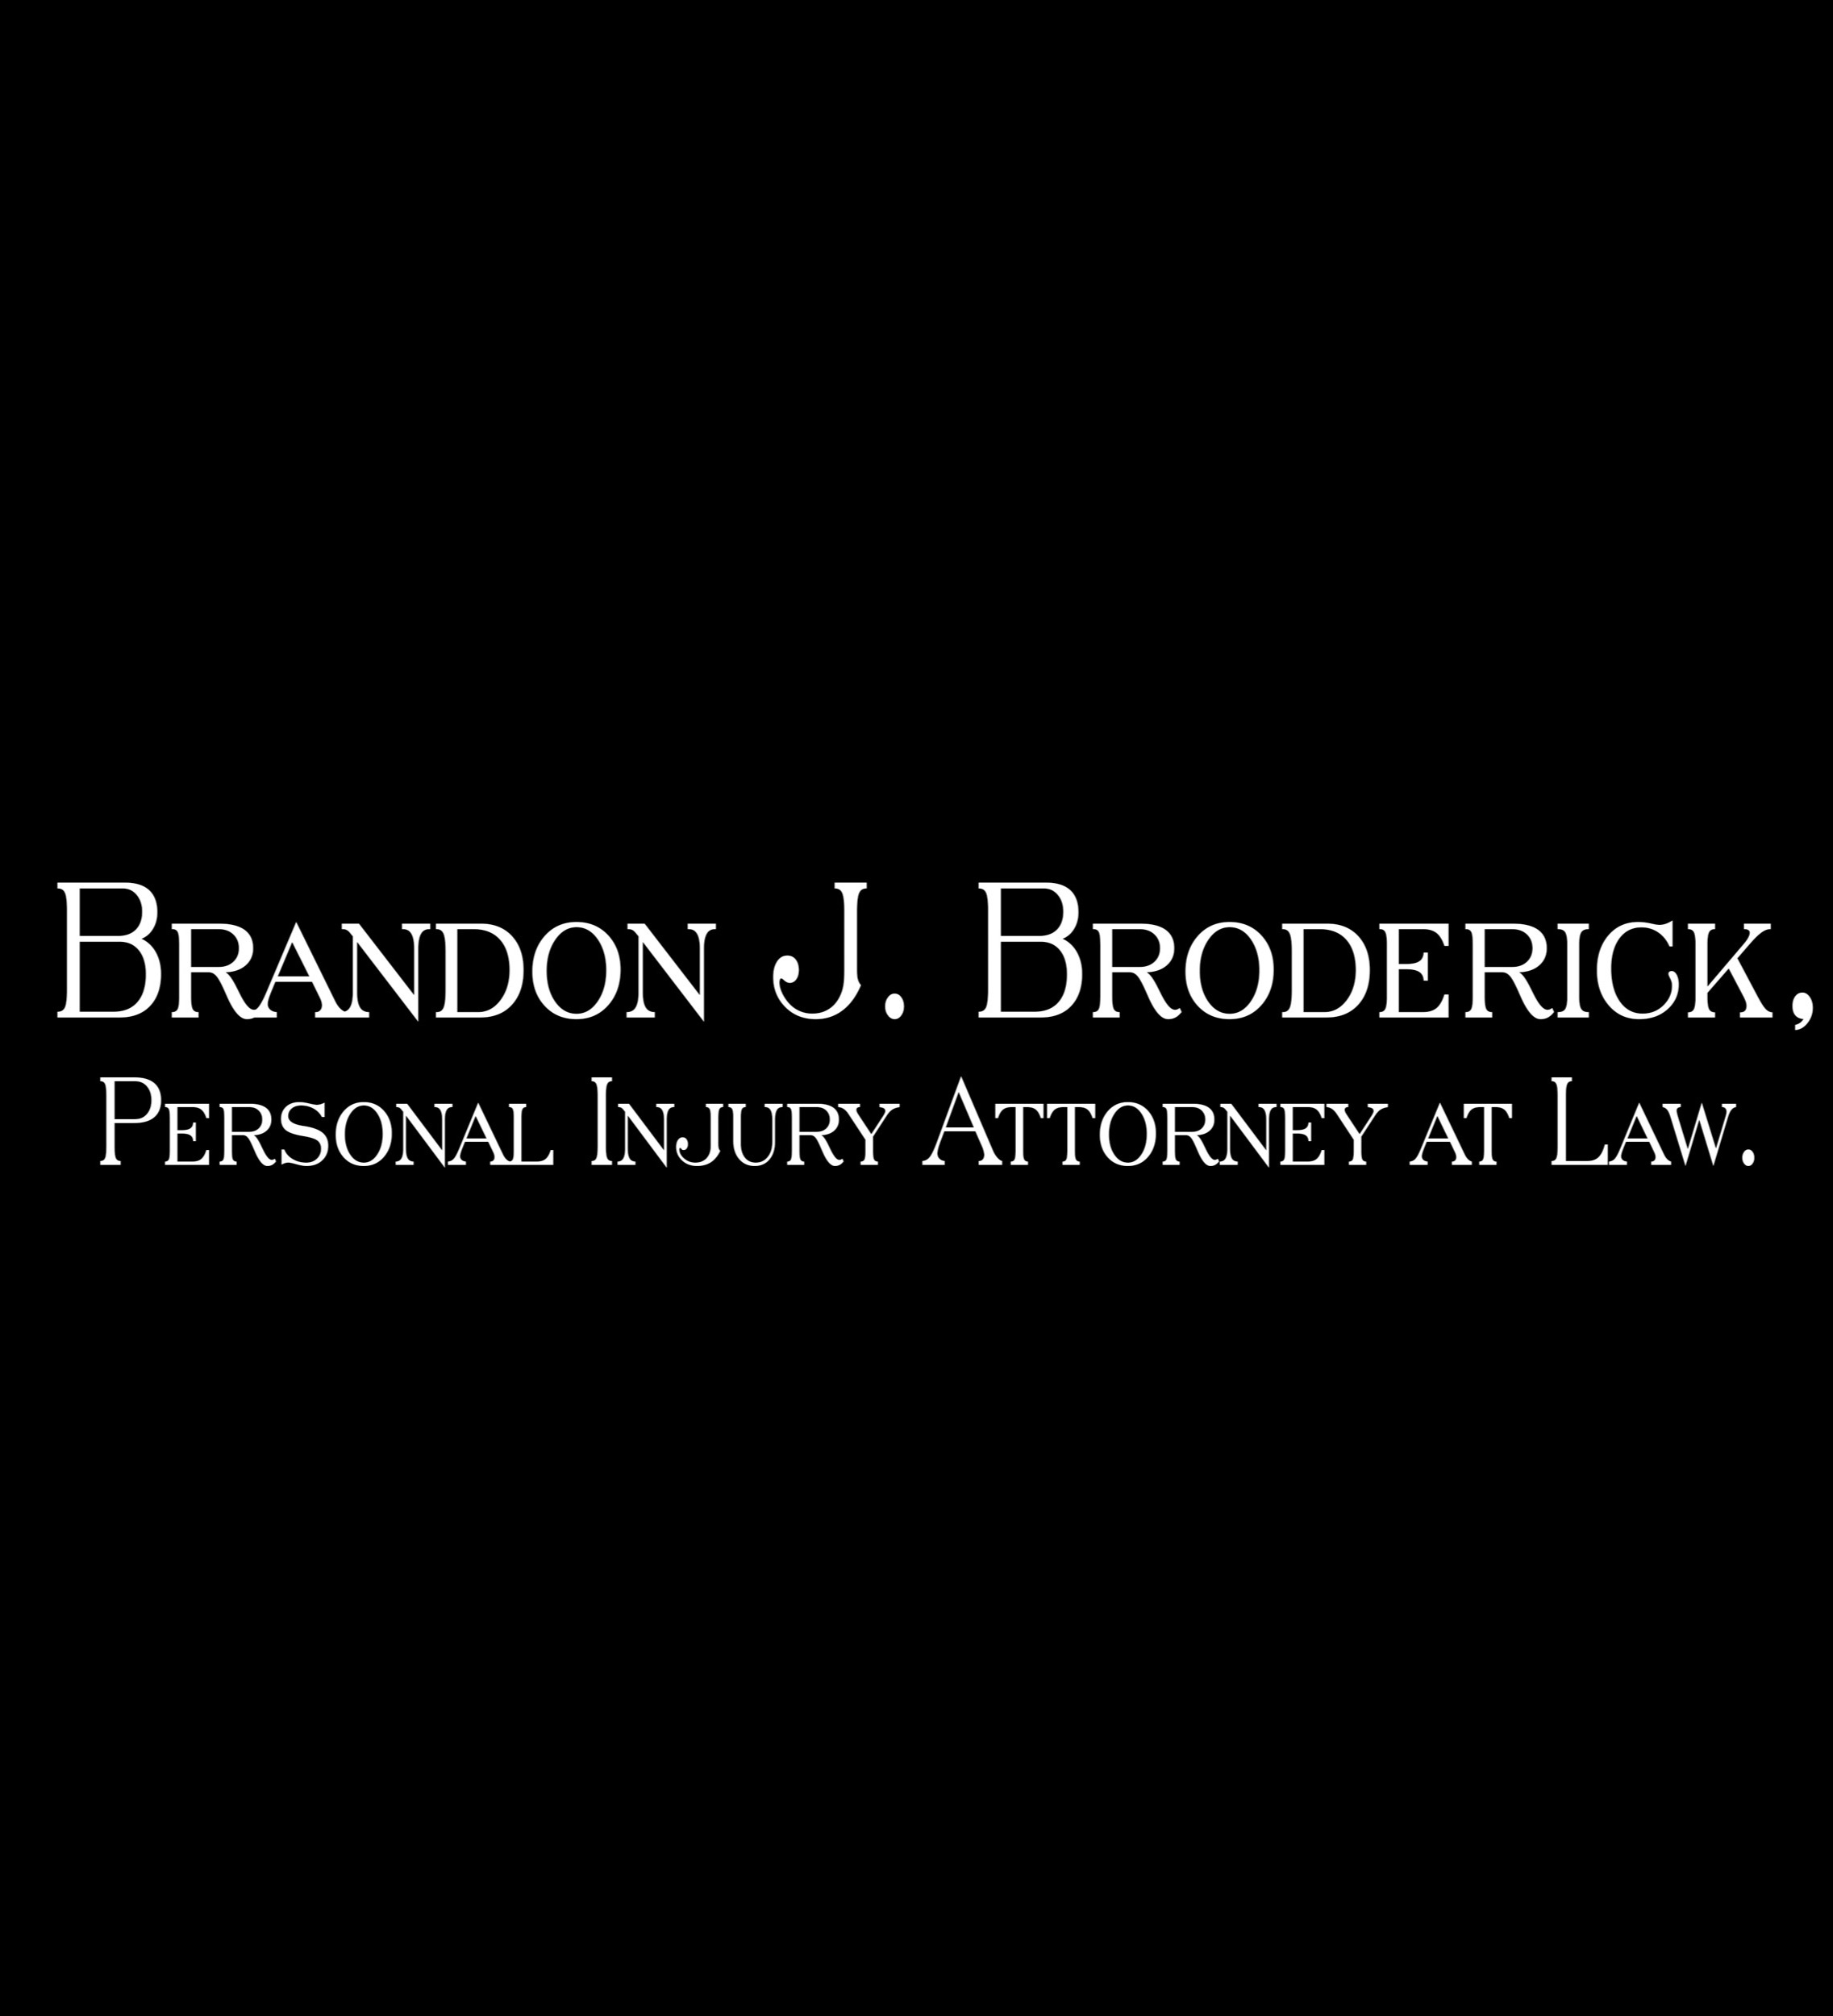 Brandon J. Broderick